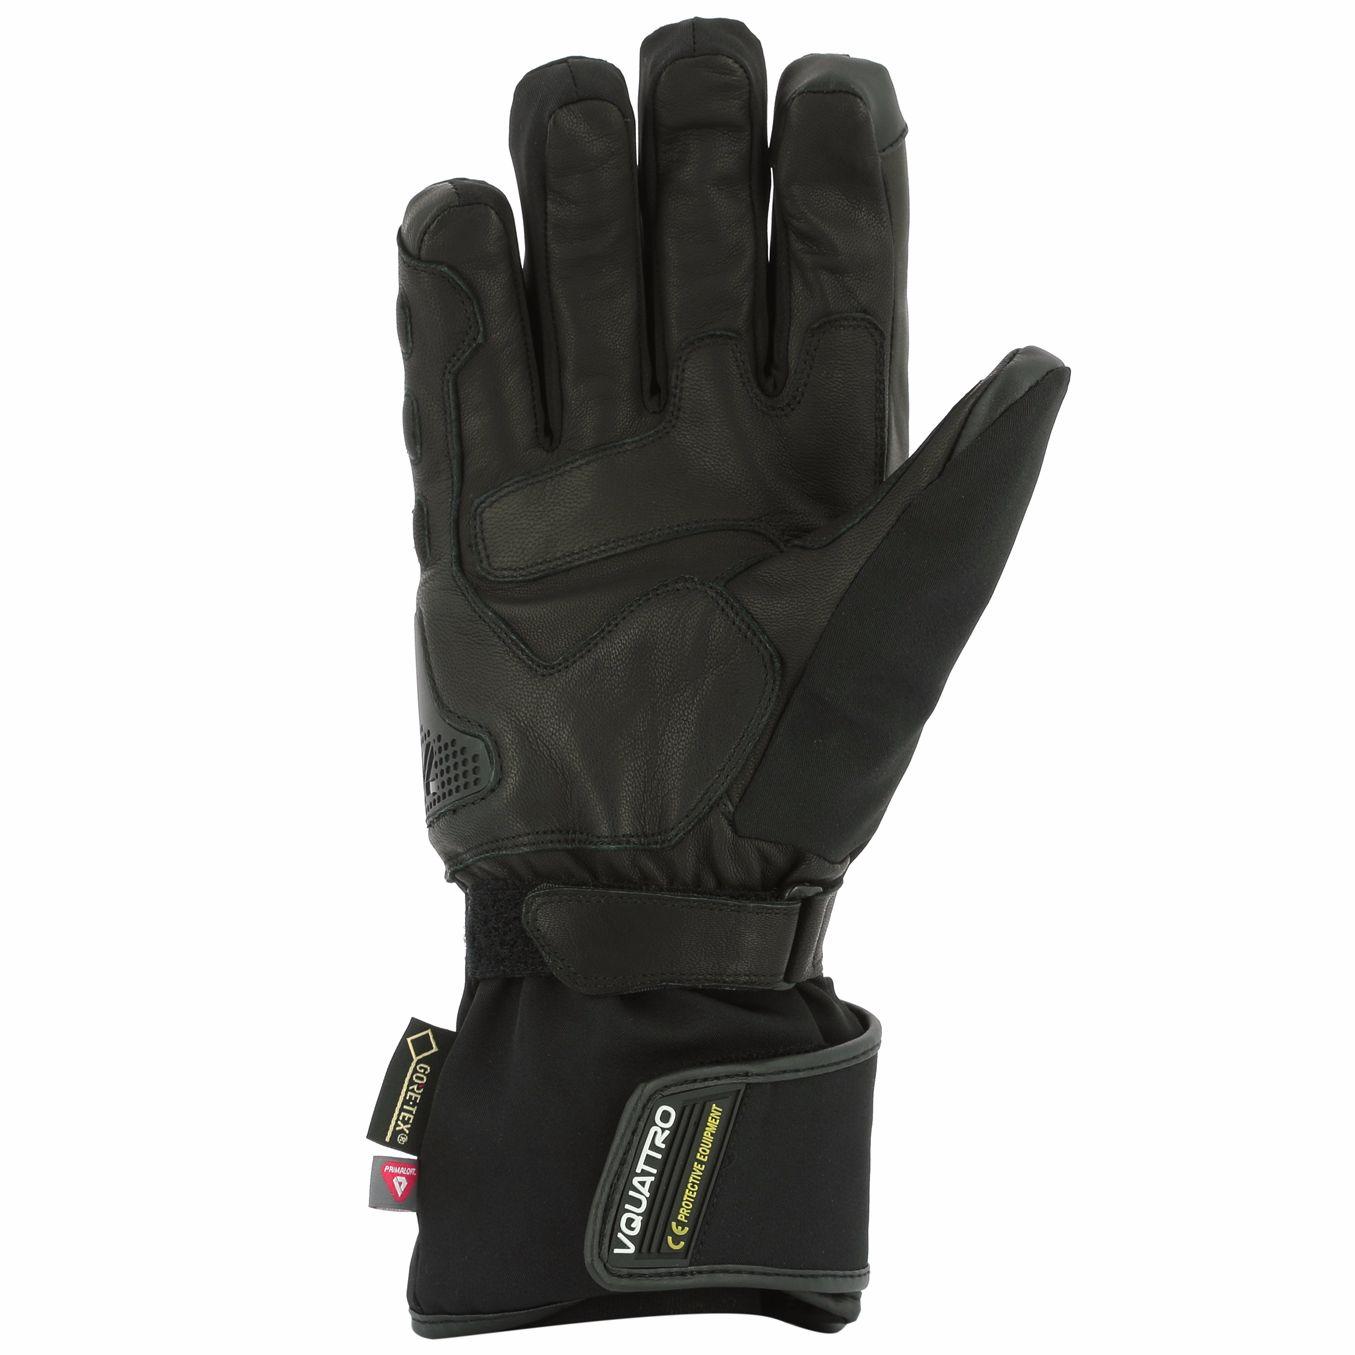 gants v quattro advance 17 2 1 goretex equipement du pilote access. Black Bedroom Furniture Sets. Home Design Ideas